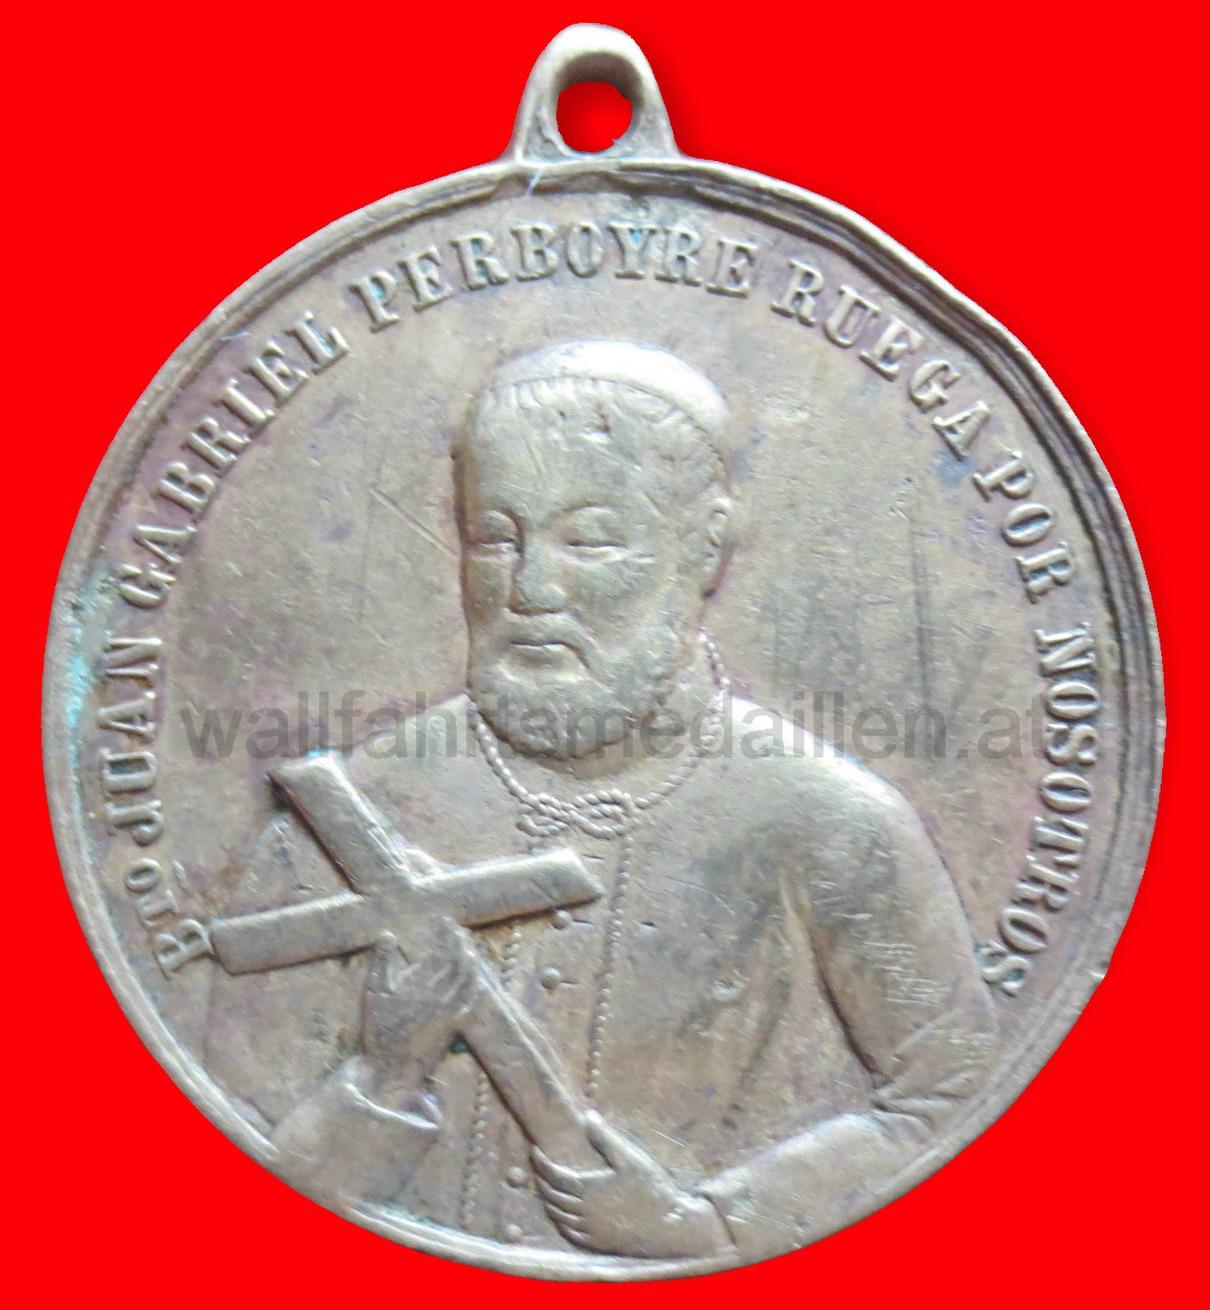 Johannes Gabriel Perboyre